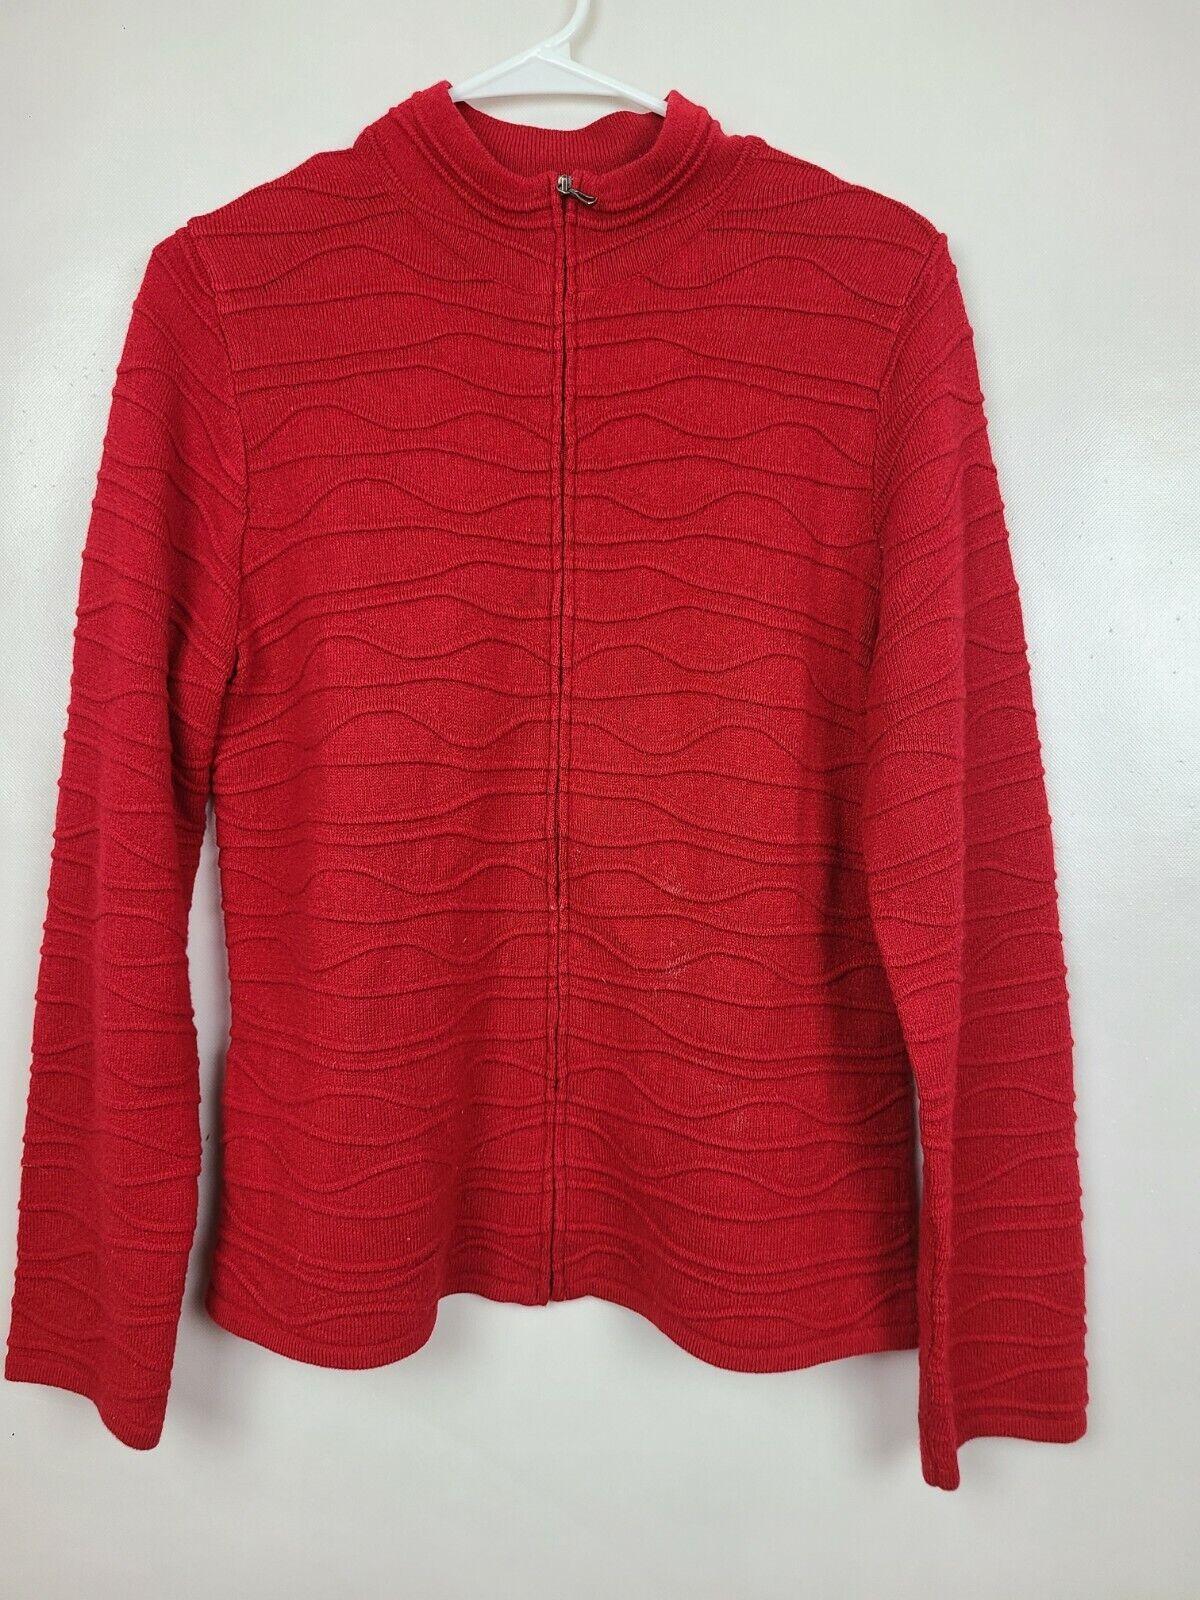 Coldwater Creek Womens Cardigan Sweater Medium Re… - image 1